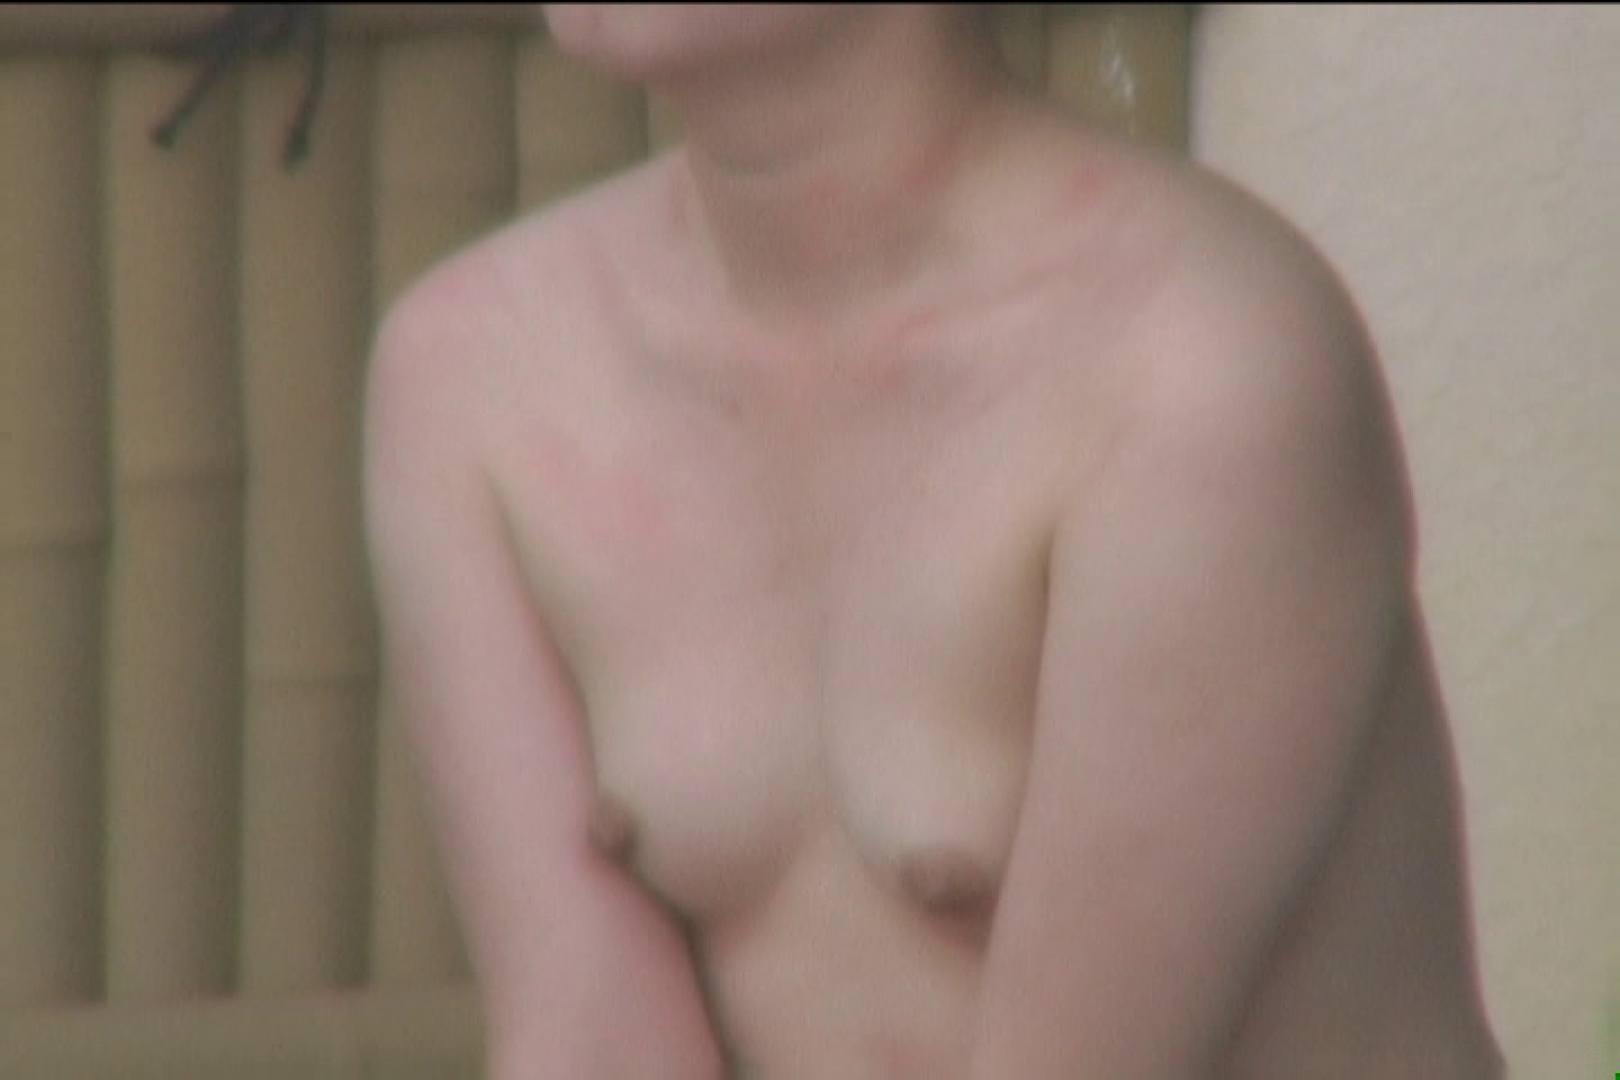 高画質露天女風呂観察 vol.018 女風呂 えろ無修正画像 104pic 83